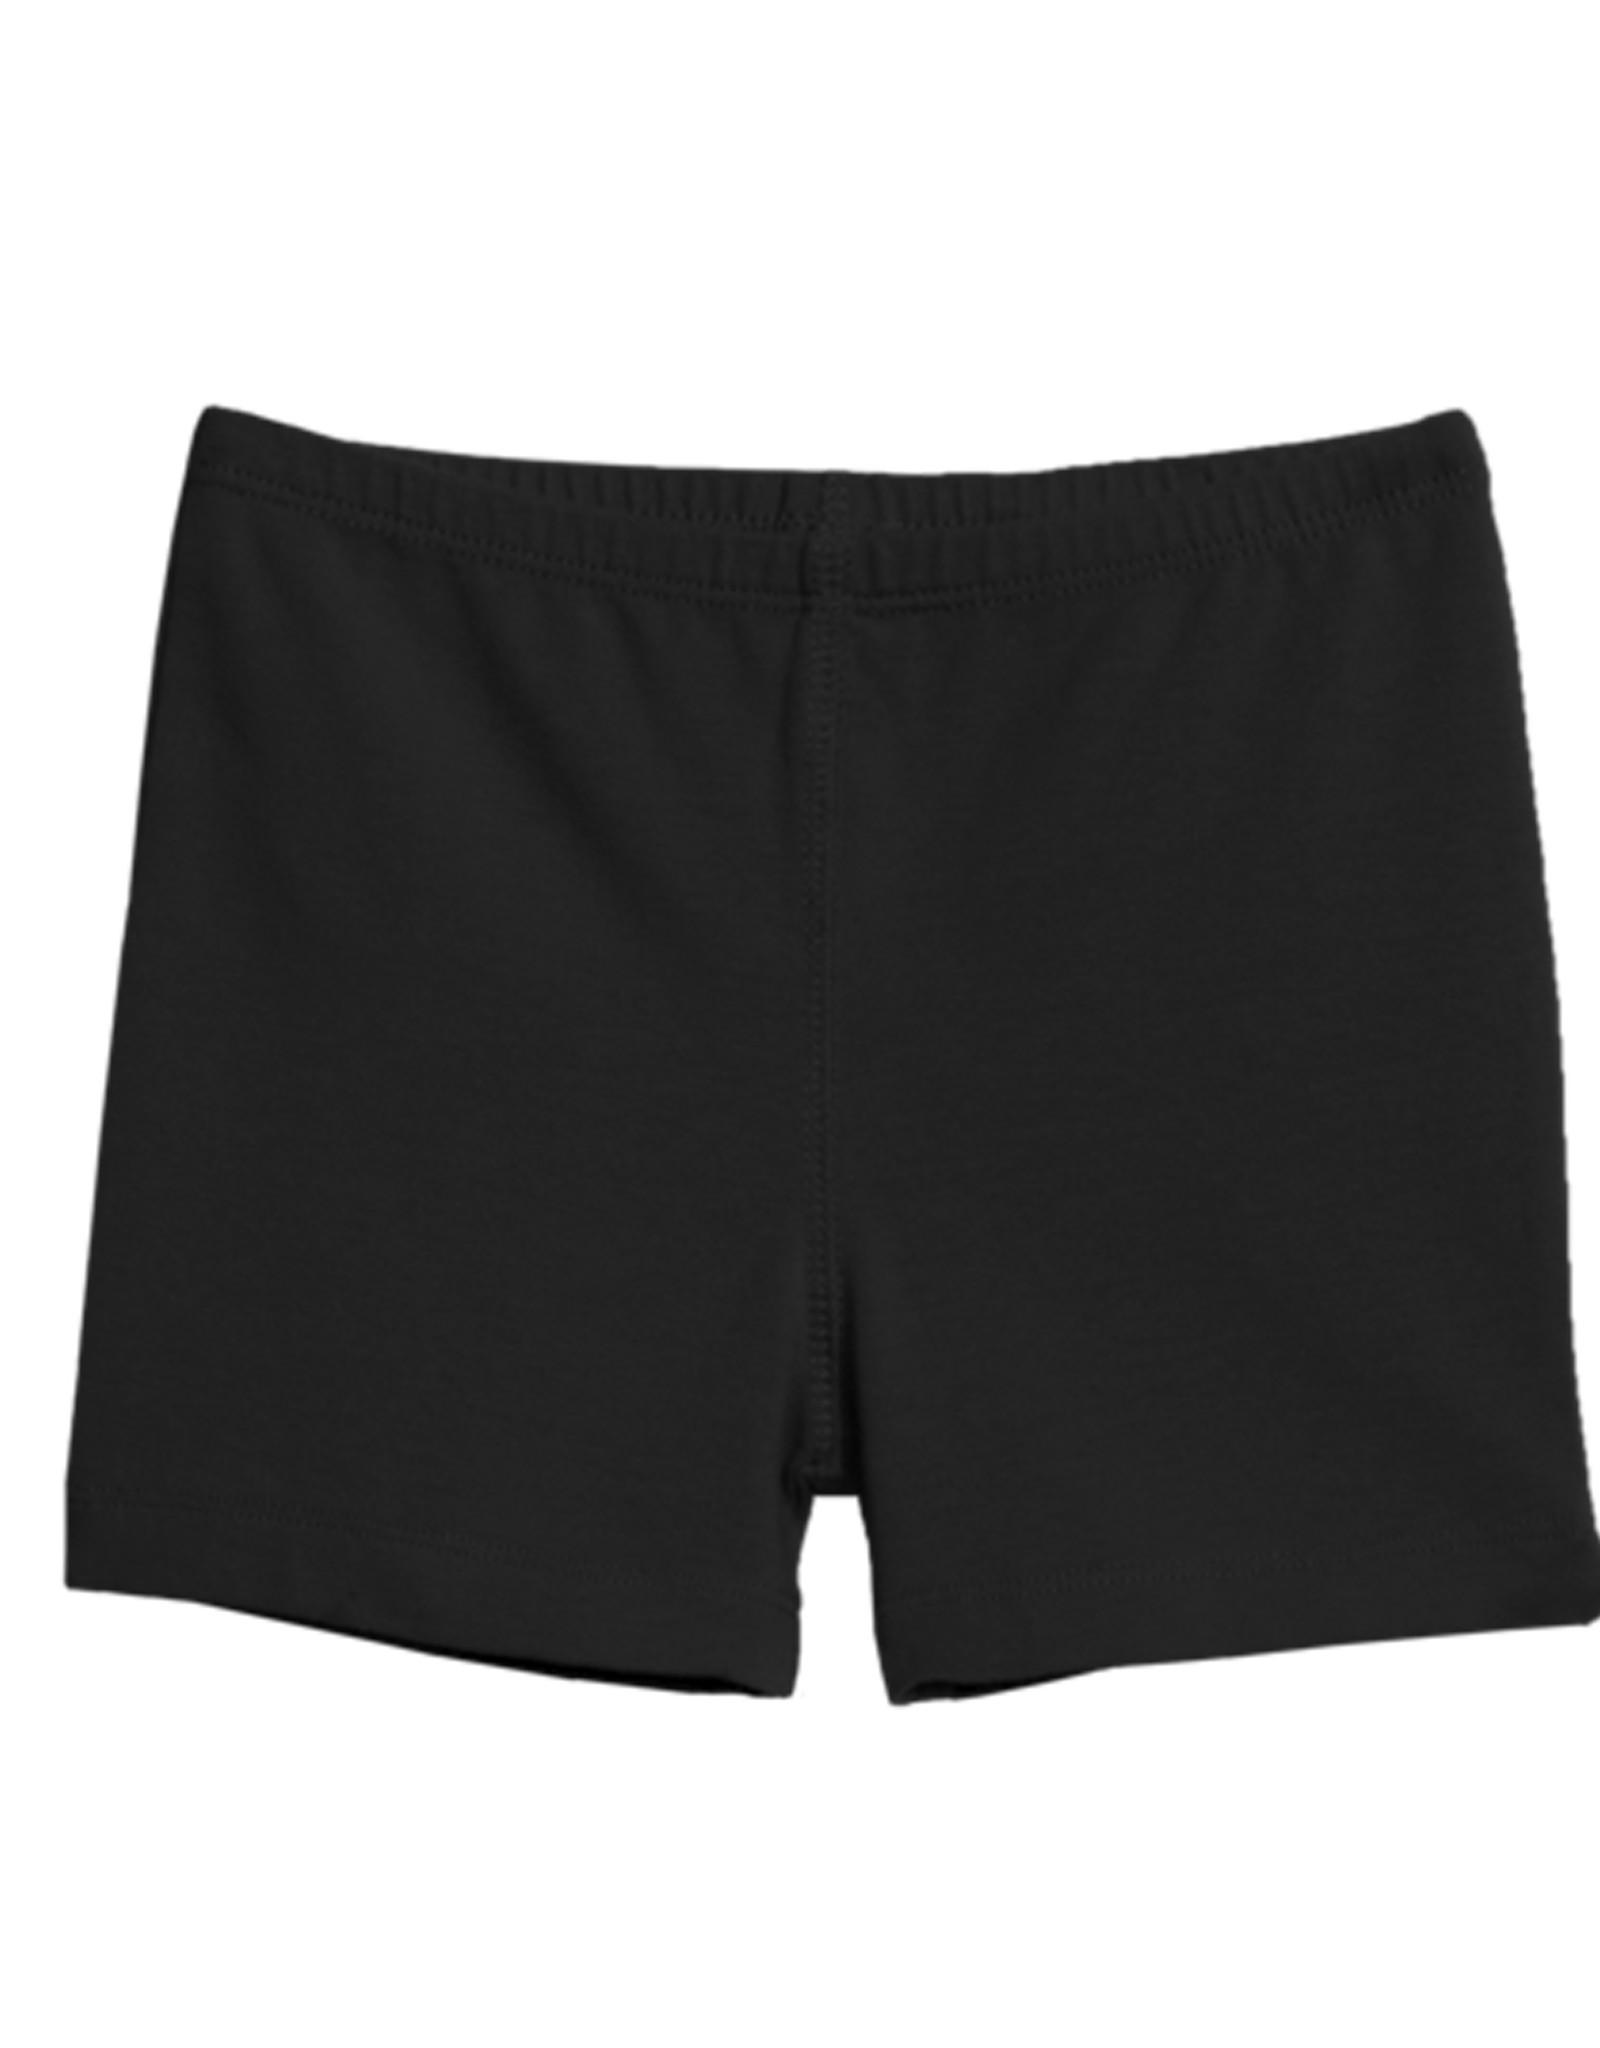 Black Privacy Shorts